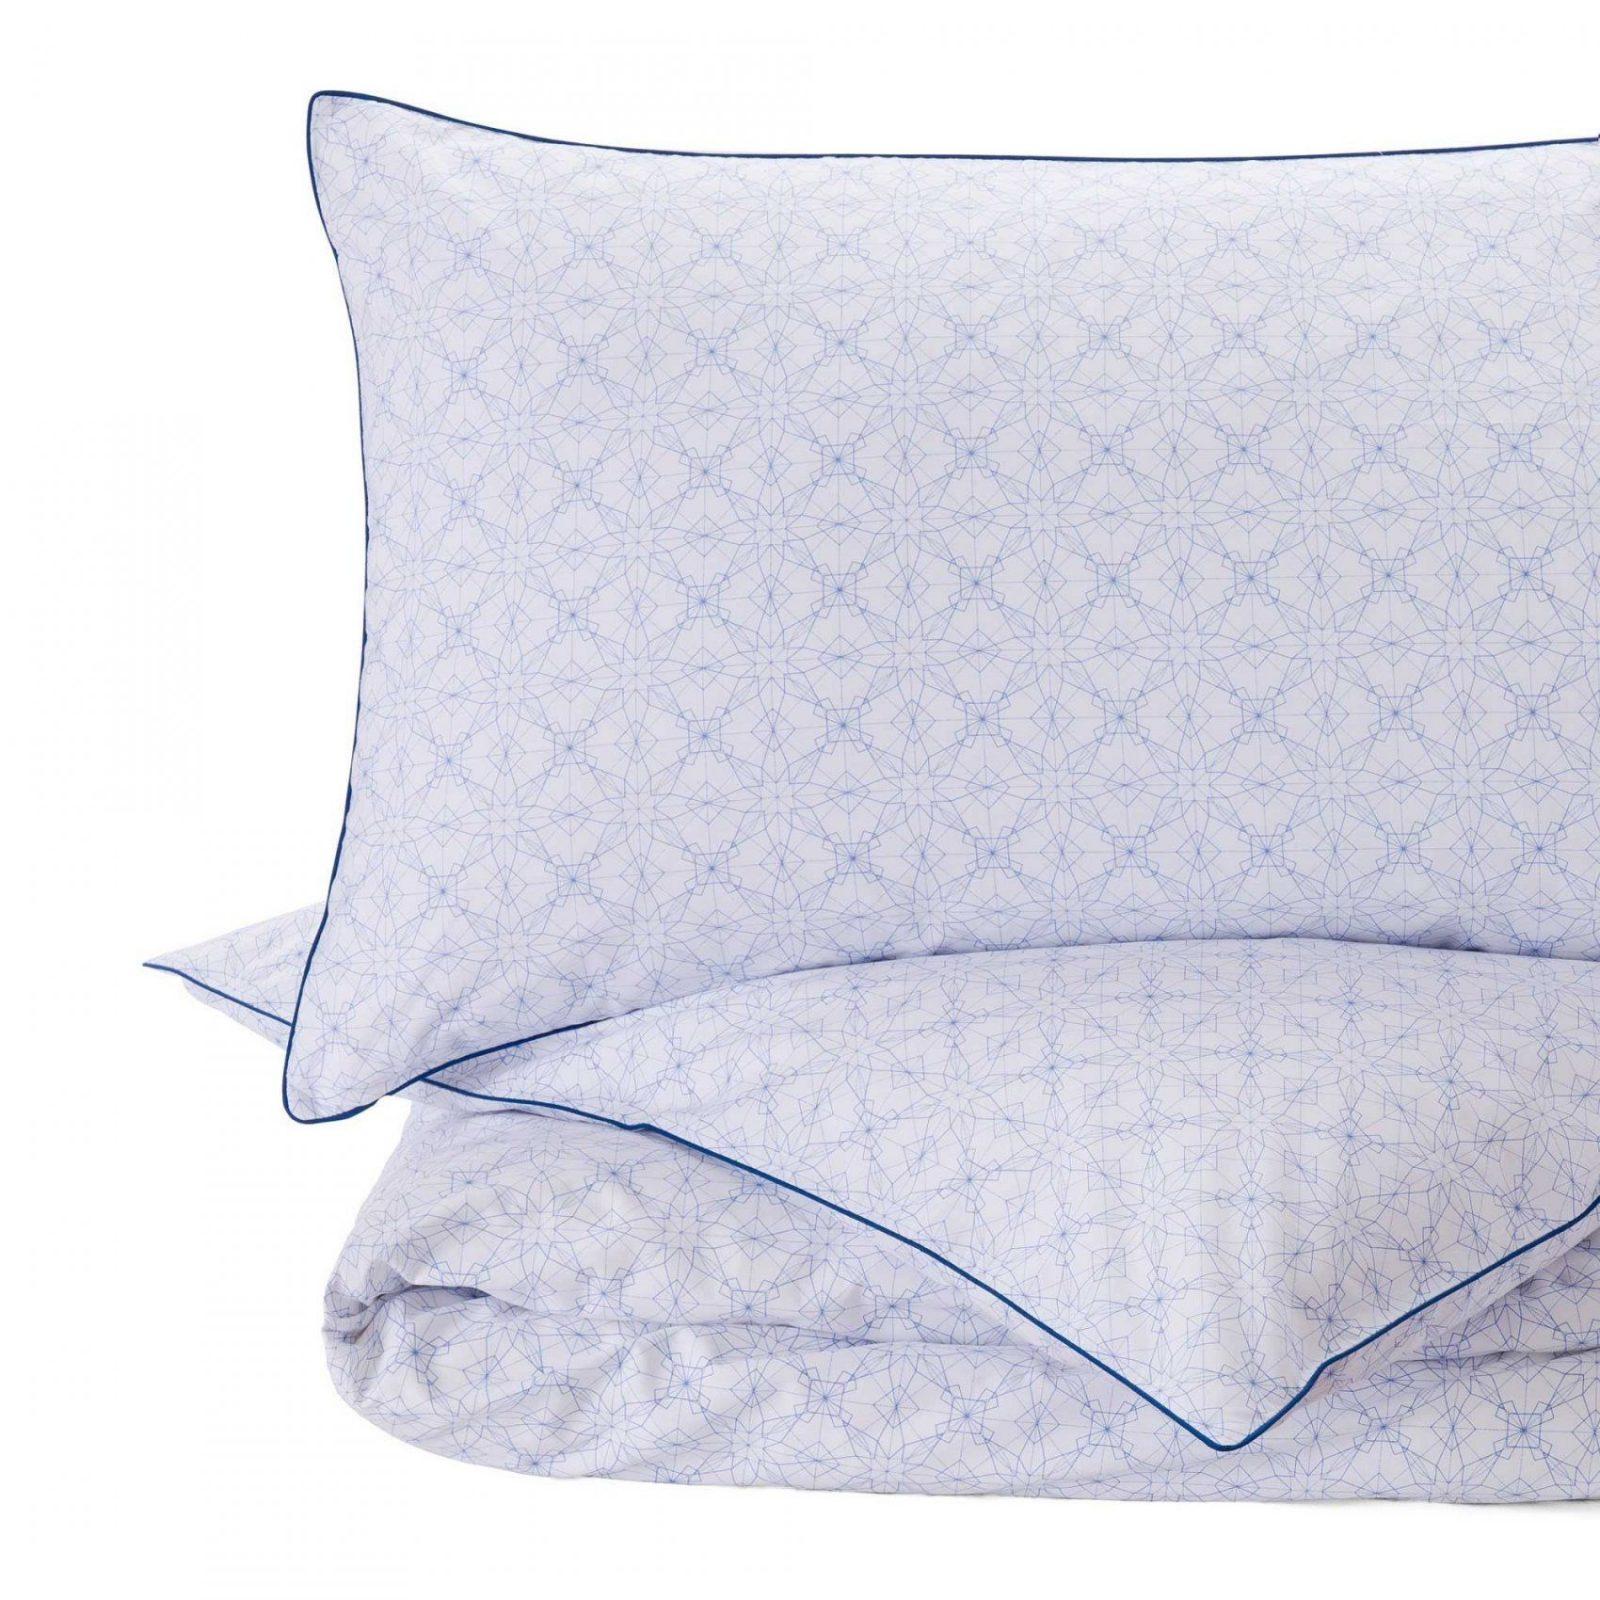 Luxus Linon Bettwäsche Wikipedia  Bettwäsche Ideen von Linon Bettwäsche Wikipedia Bild